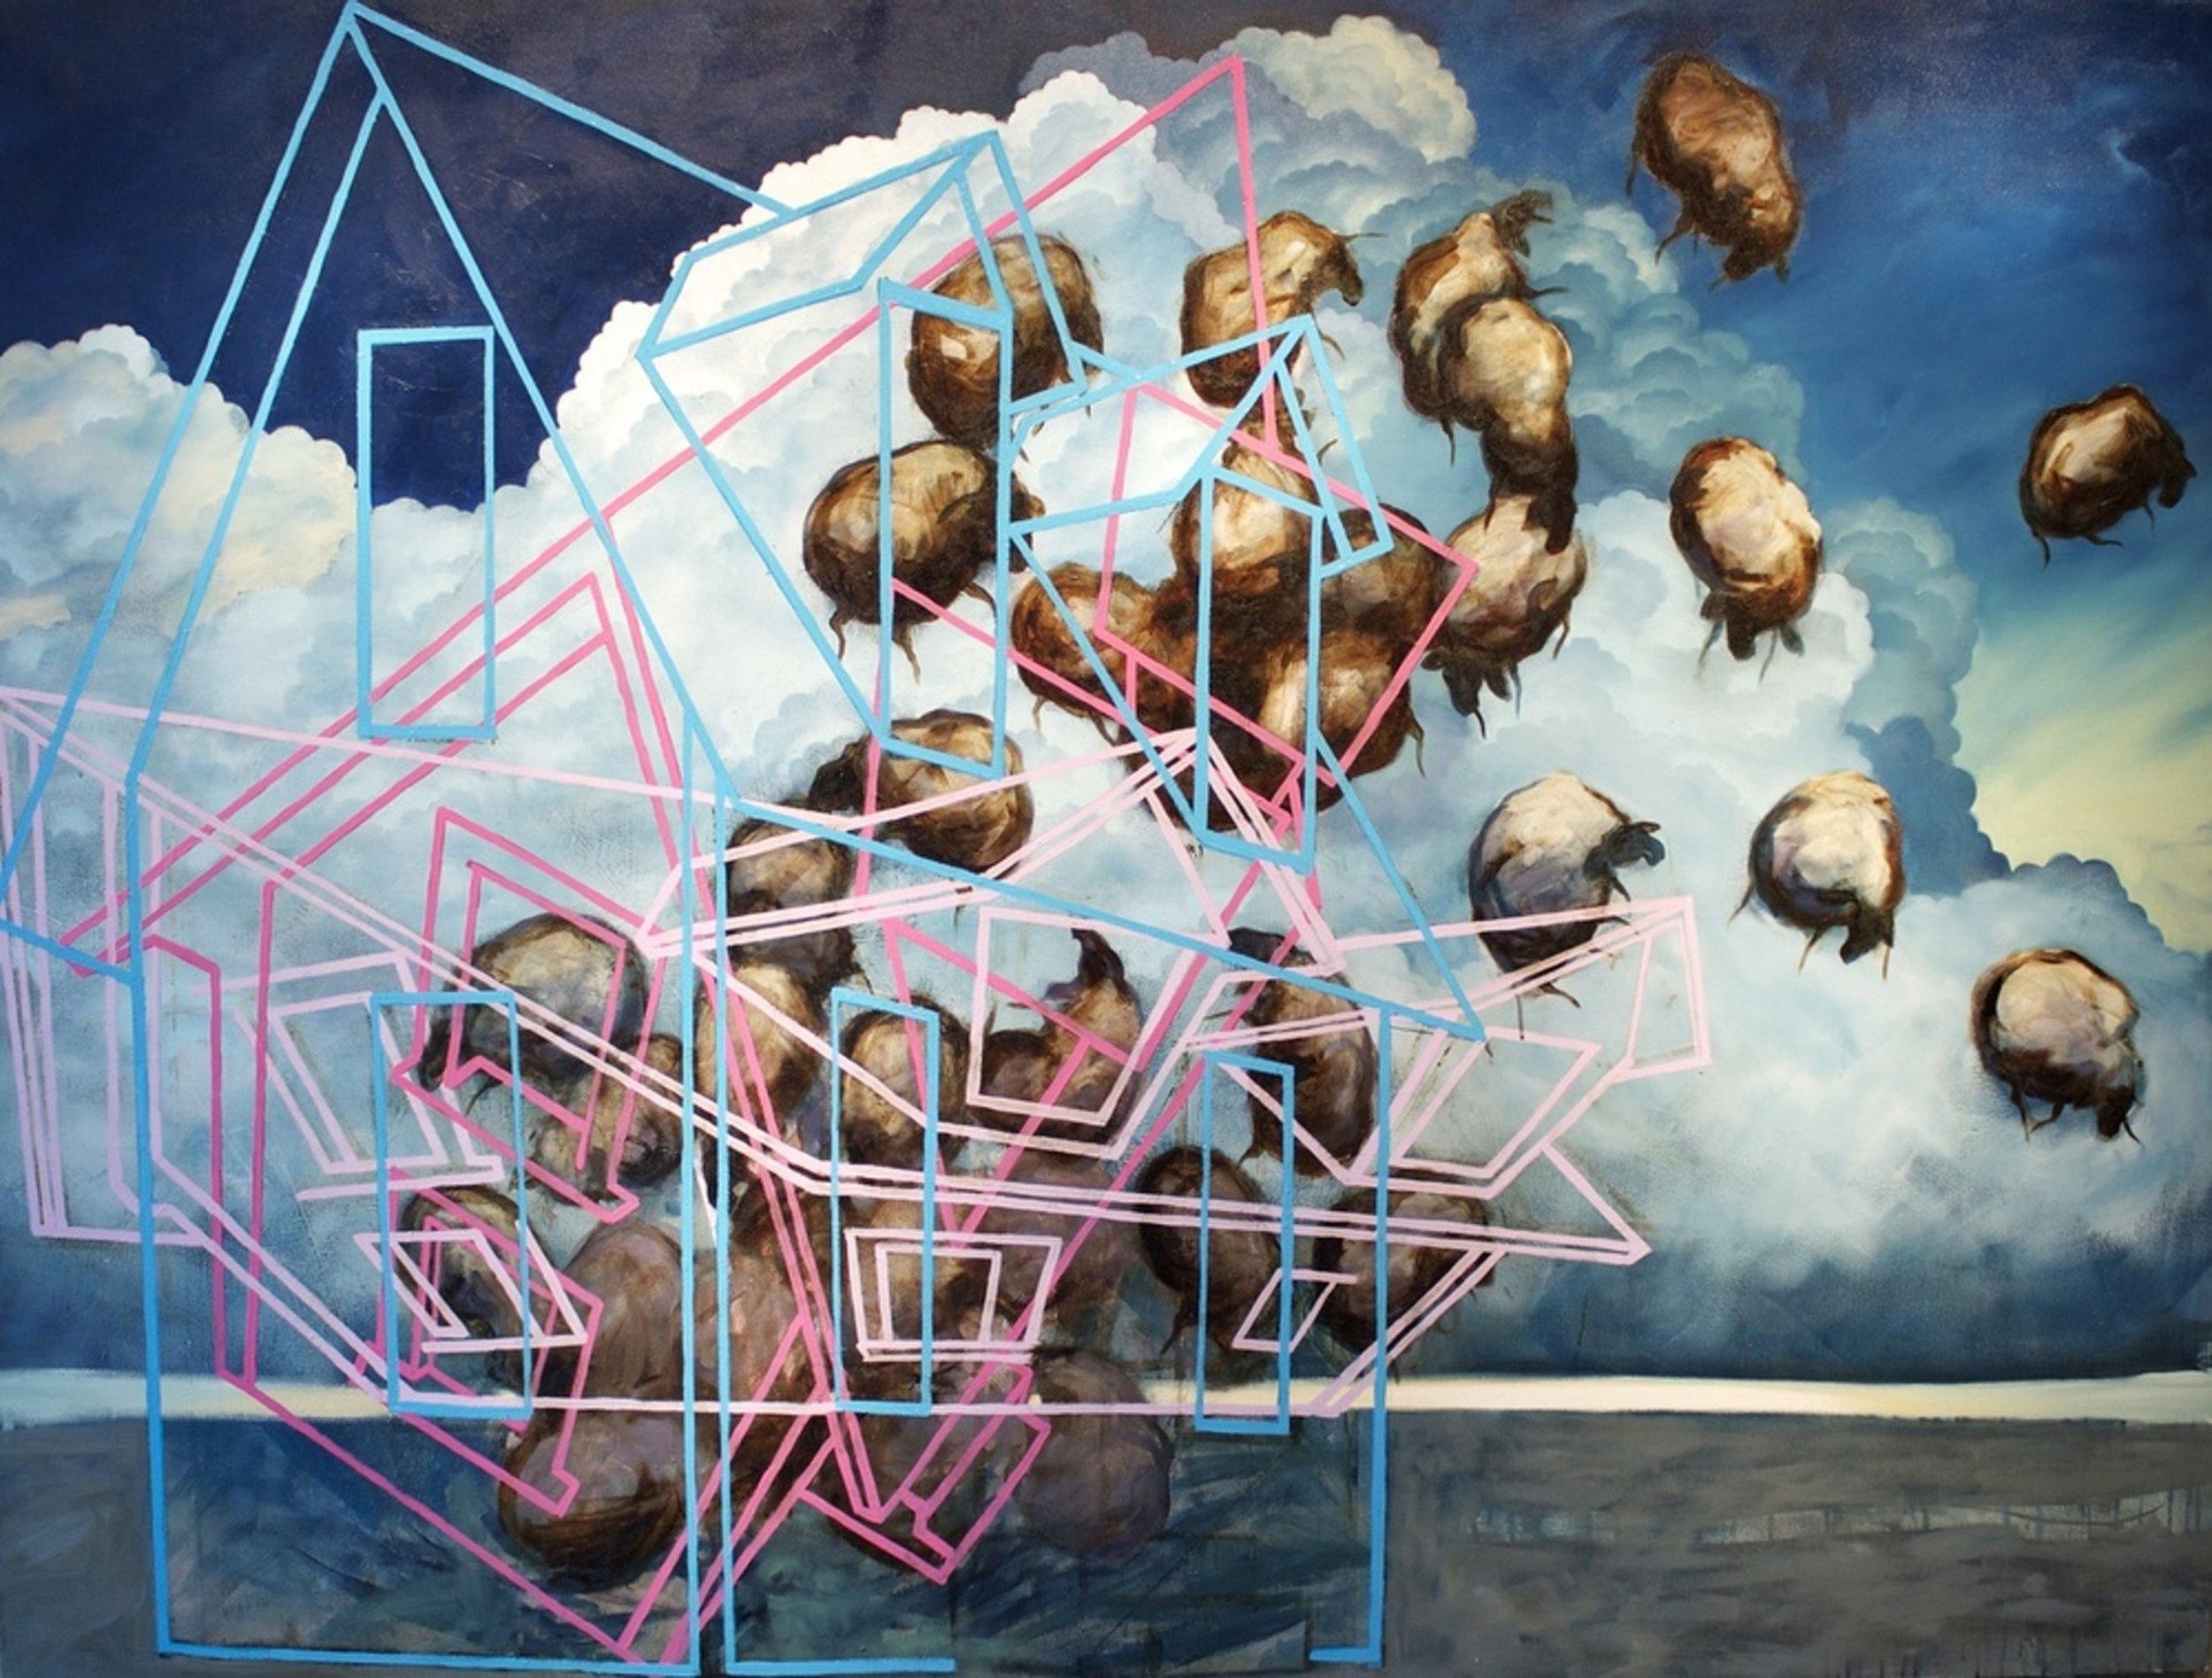 Orbit, Oil on canvas, 65x80, courtesy of Glave Kocen Gallery